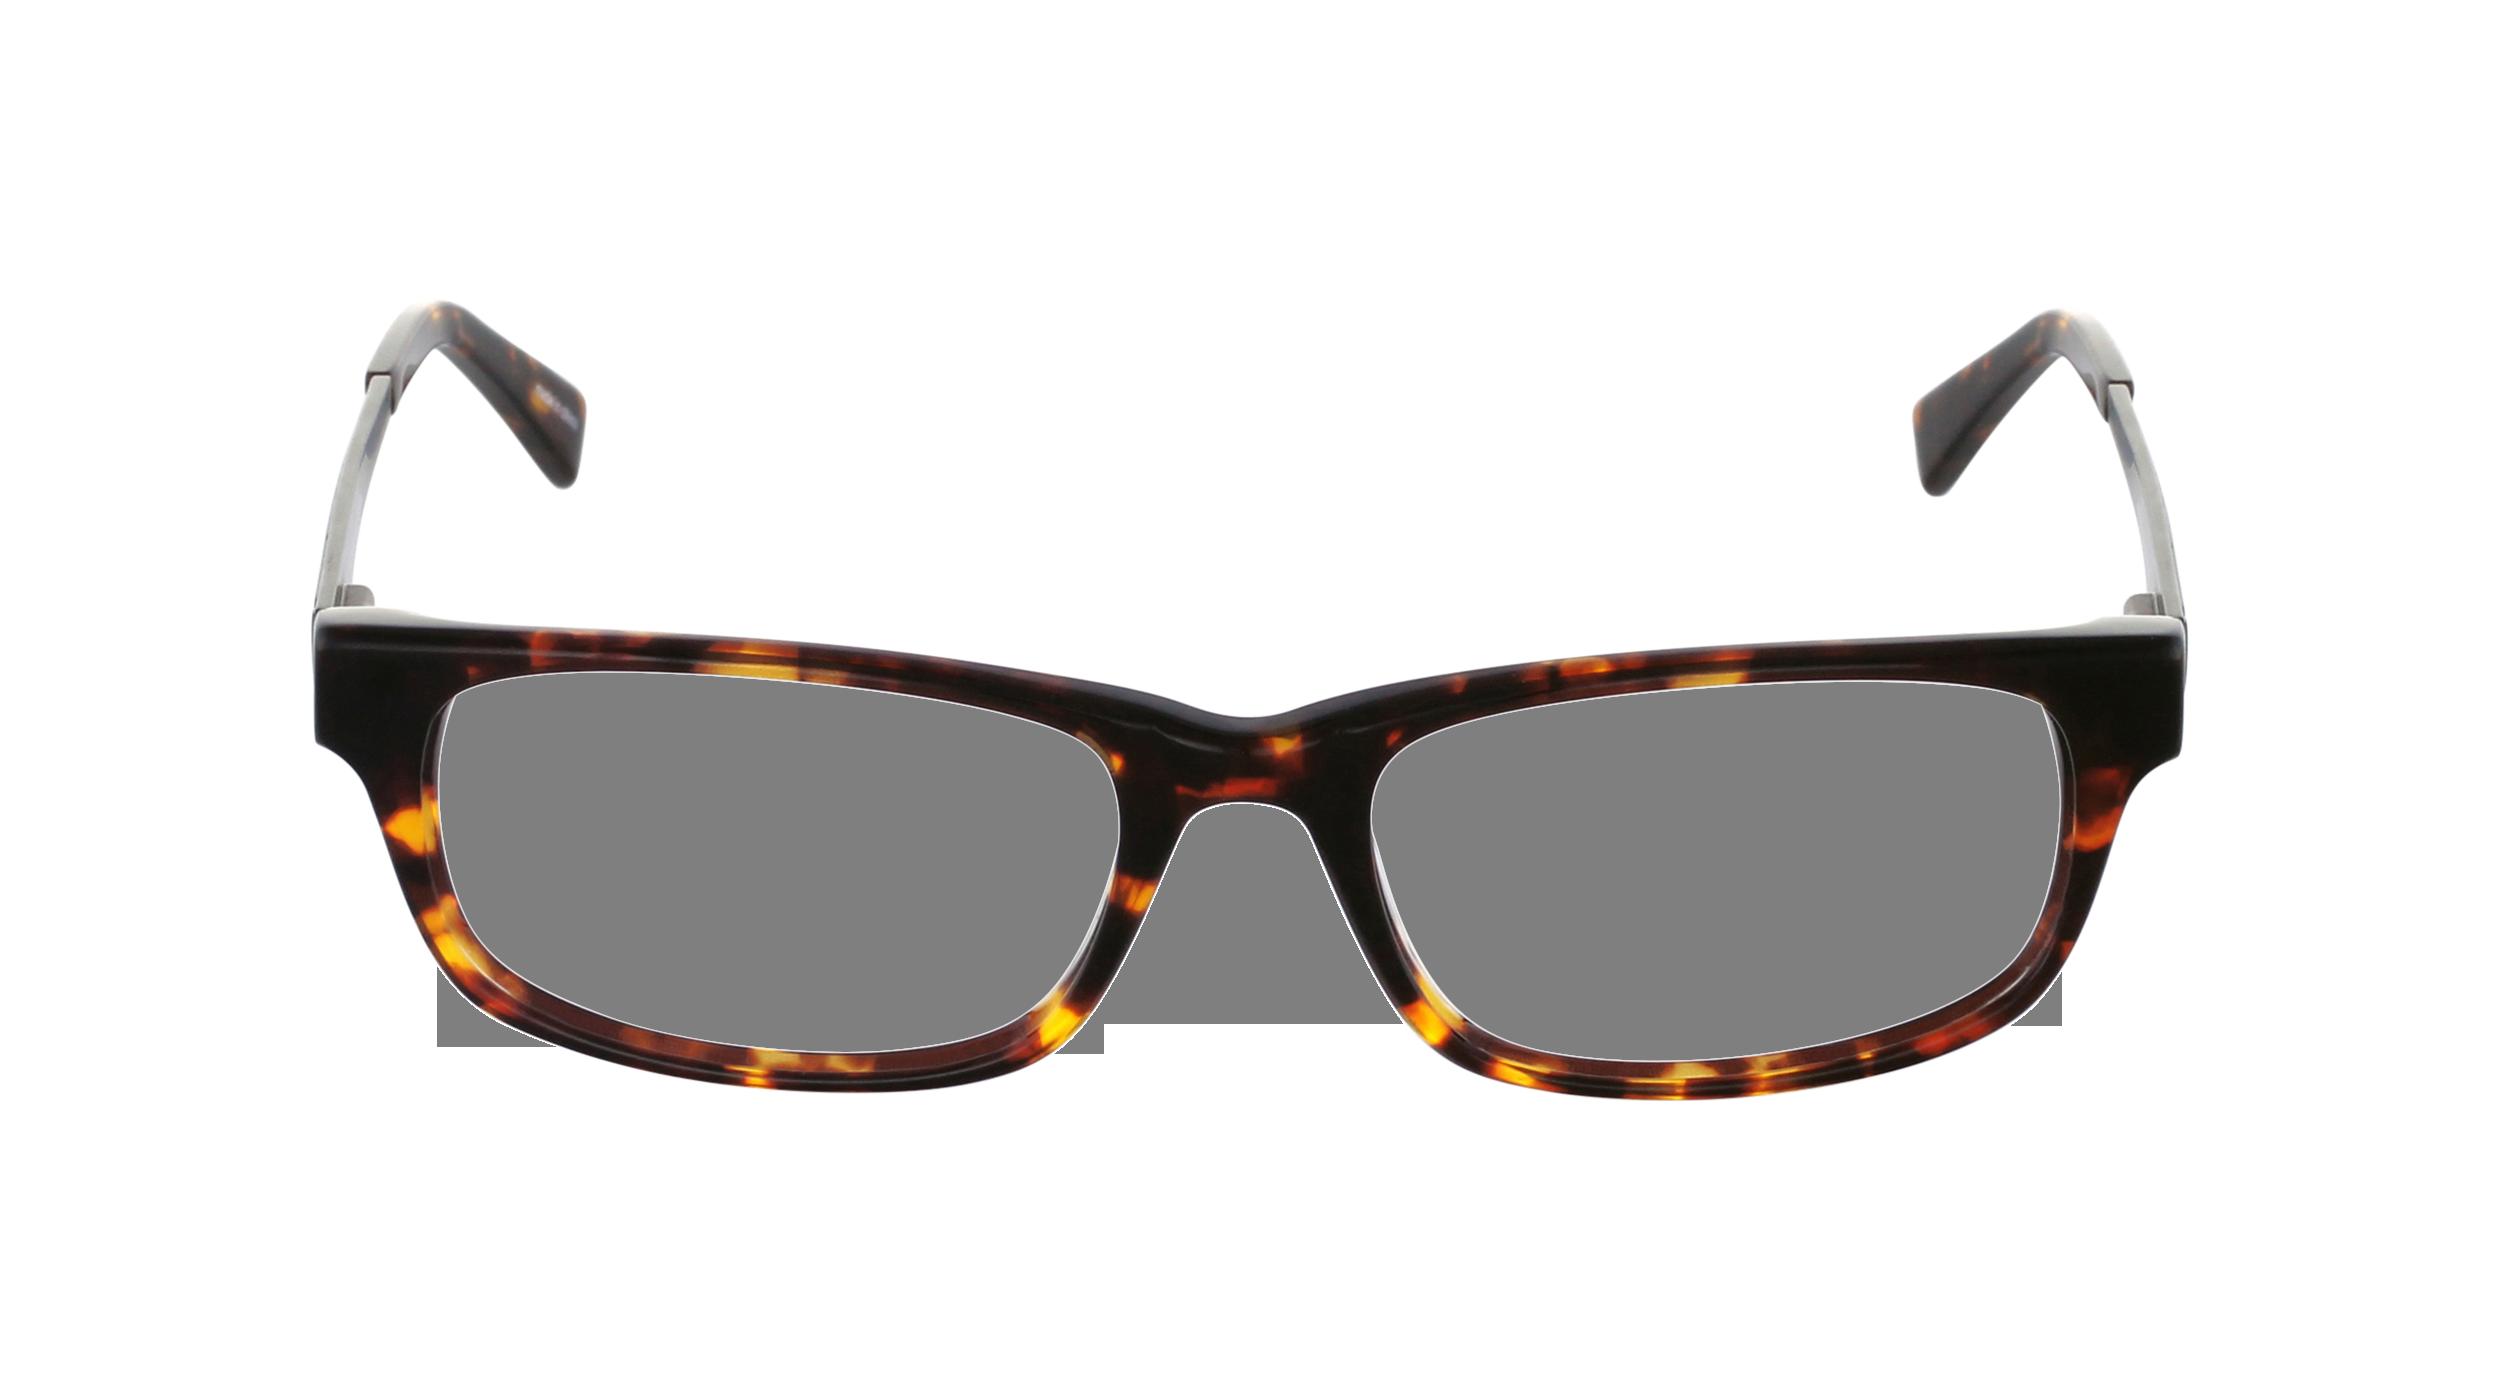 Eyeglasses Frames Jcpenney : Columbia Birney Glasses - JCPenney Optical